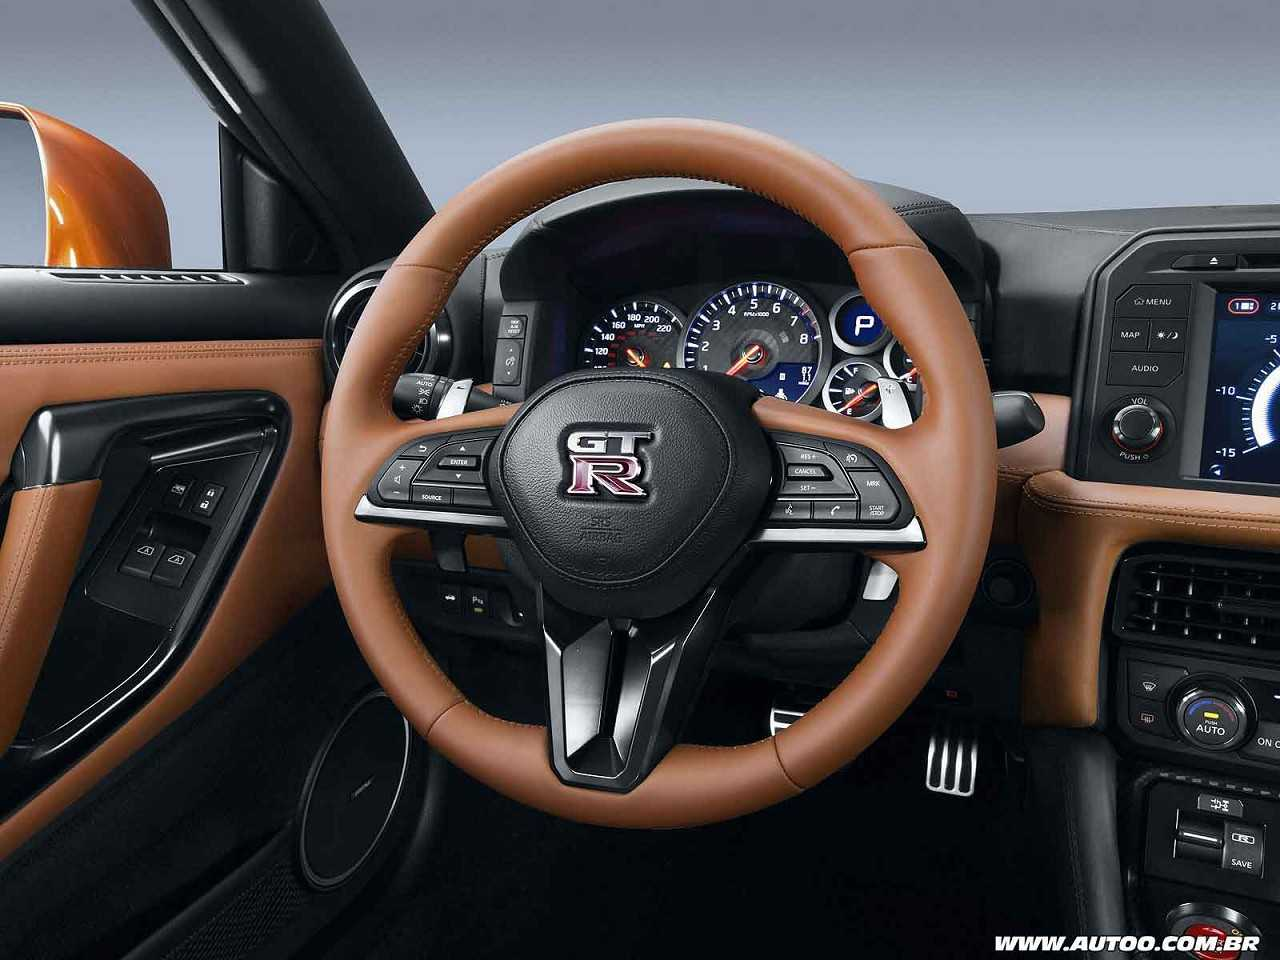 NissanGT-R 2017 - volante